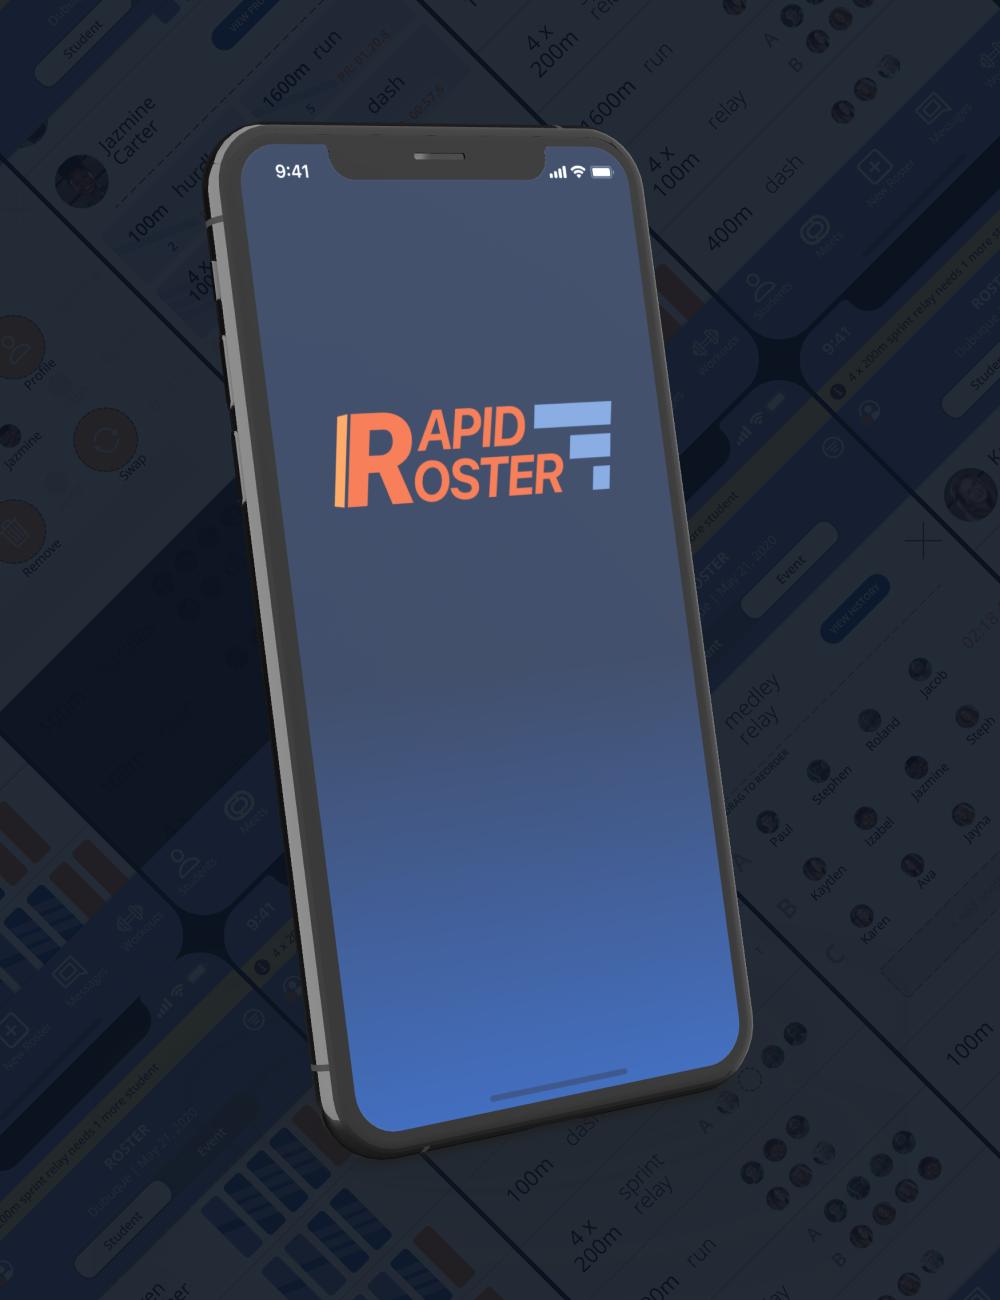 Rapid Roster splash screen